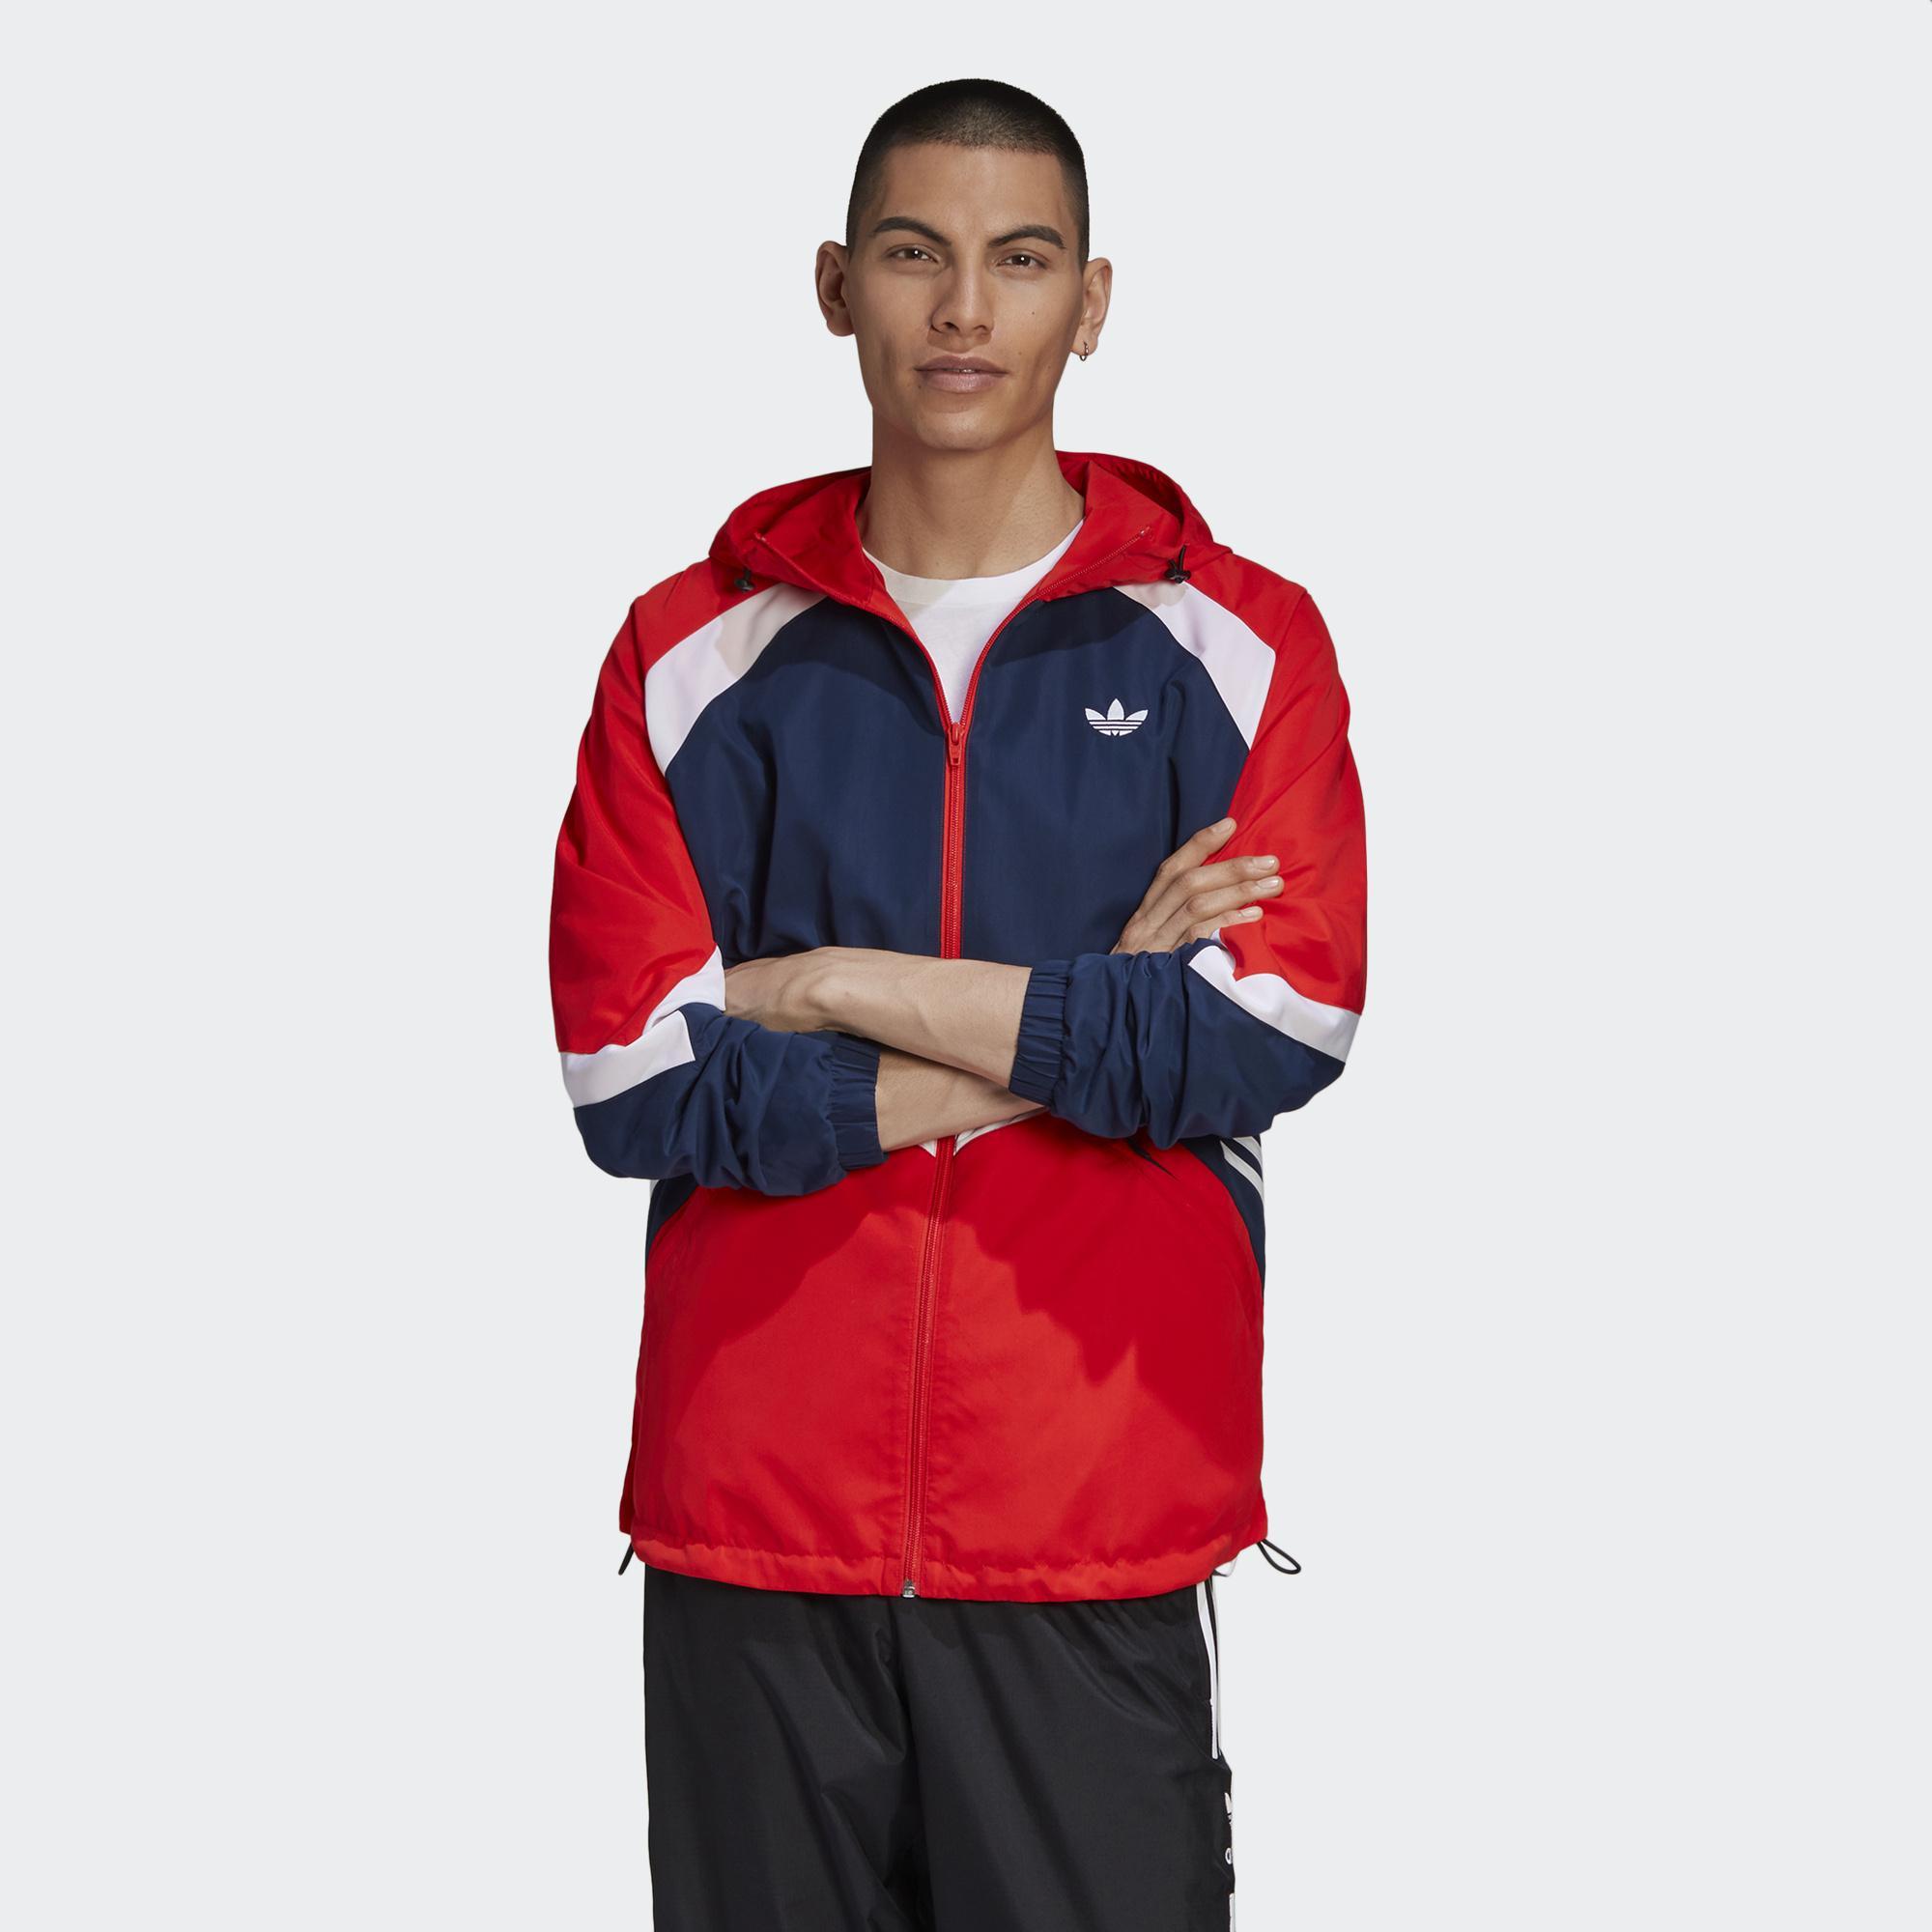 Adidas ORIGINALS SPRT 男裝 外套 連帽 風衣 三葉草 可調式下襬 撞色 紅藍【運動世界】GJ6735